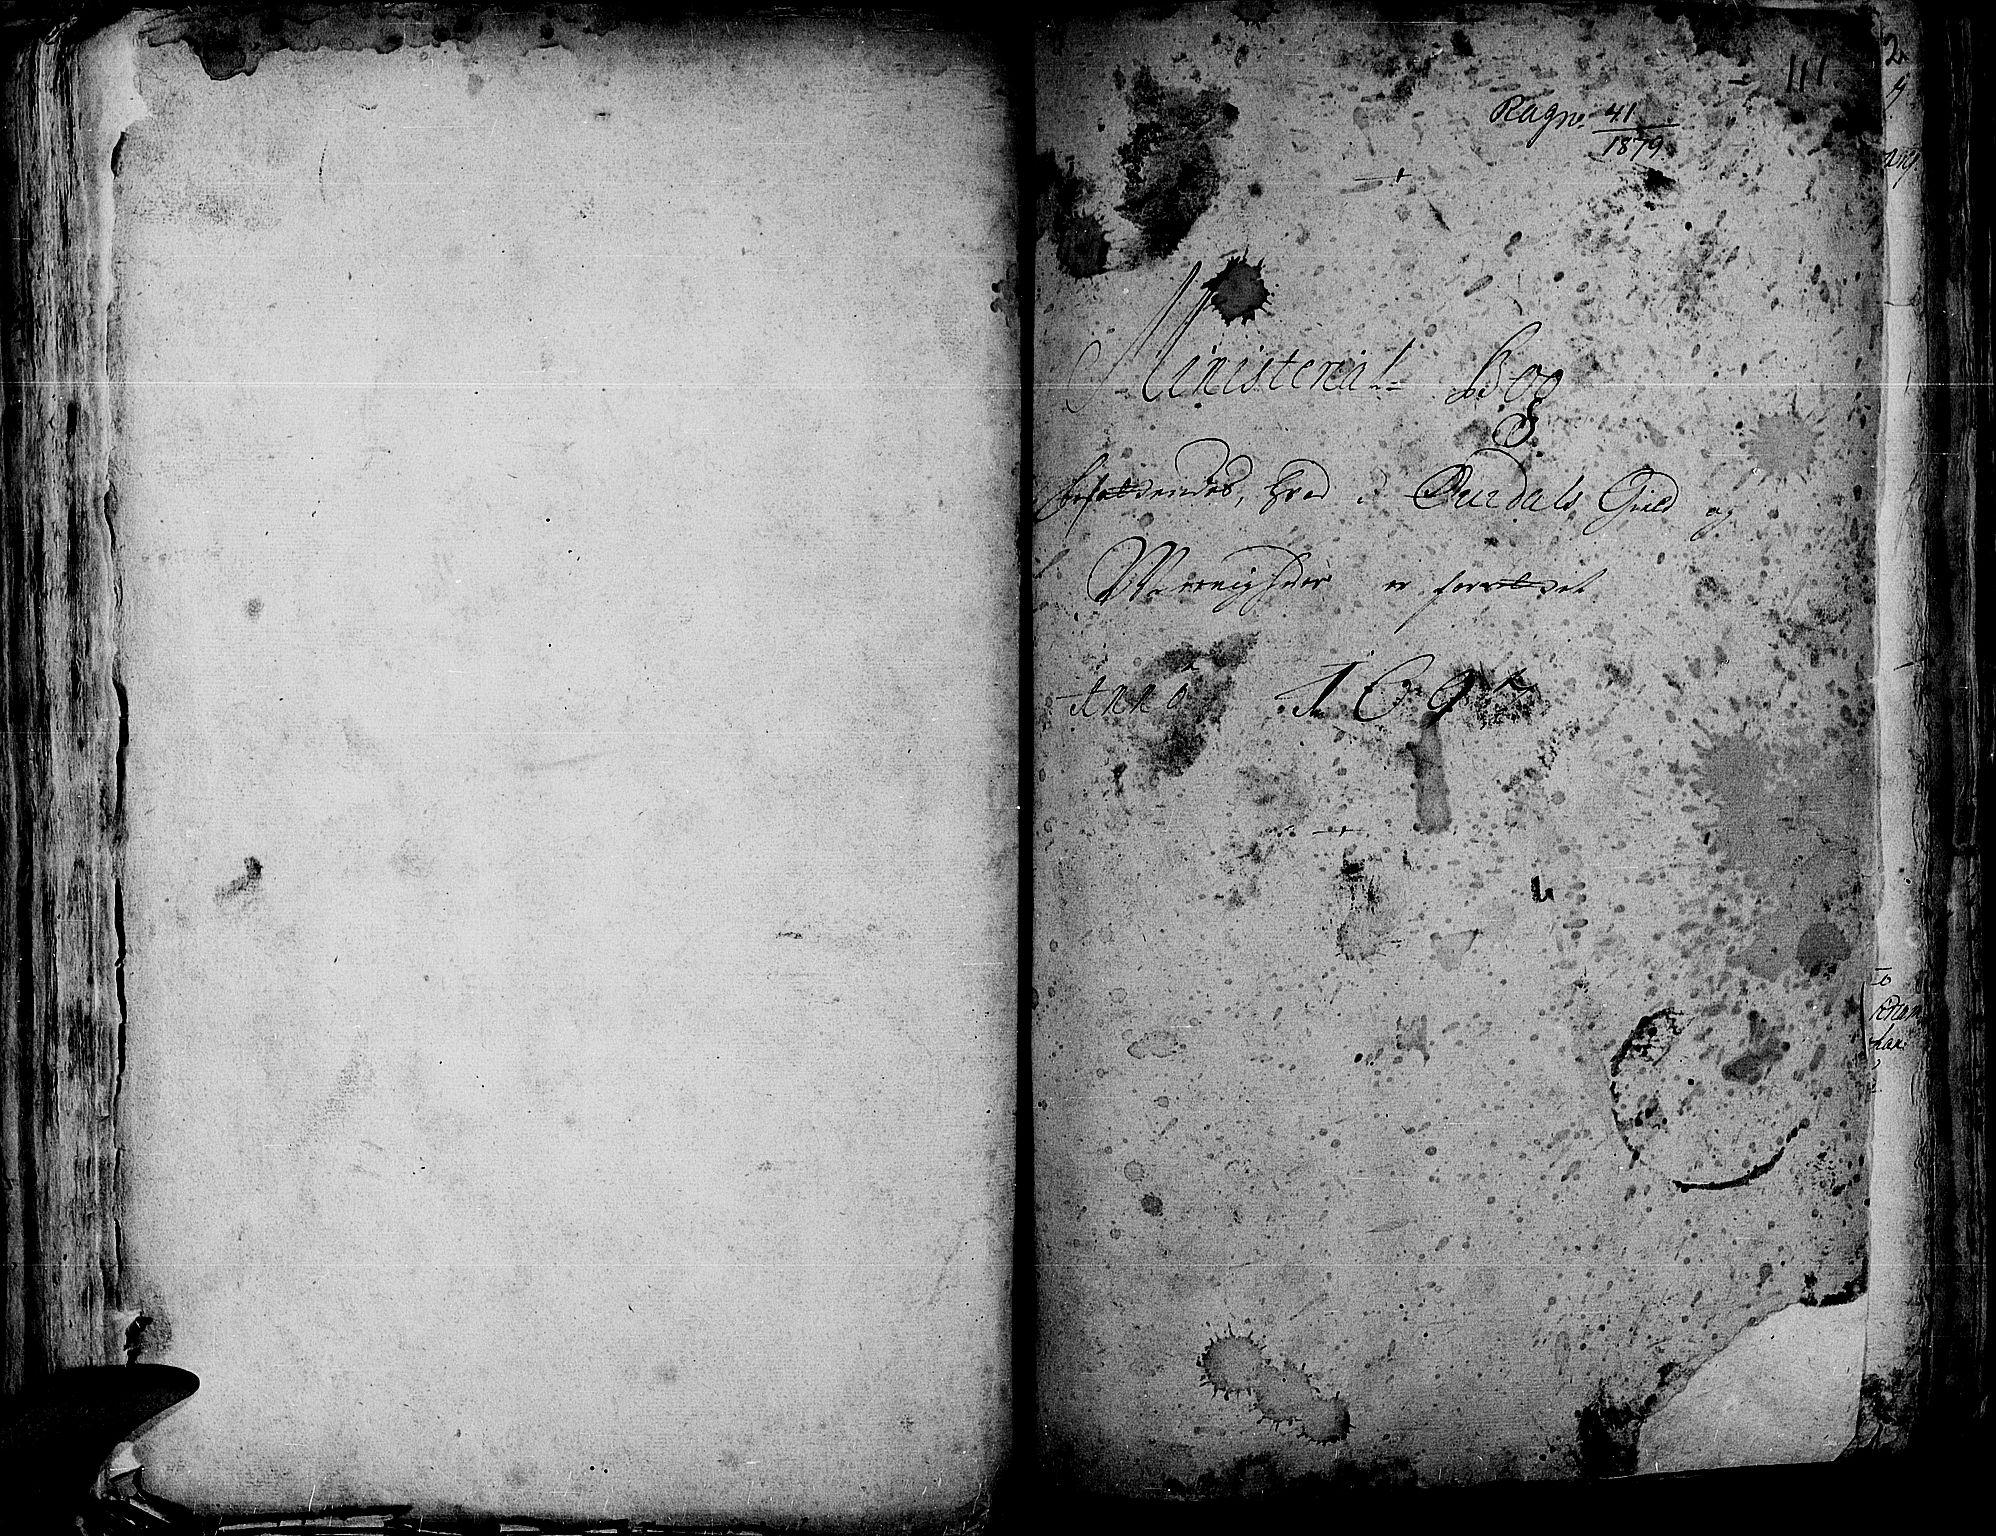 SAH, Aurdal prestekontor, Ministerialbok nr. 1-3, 1692-1730, s. 111